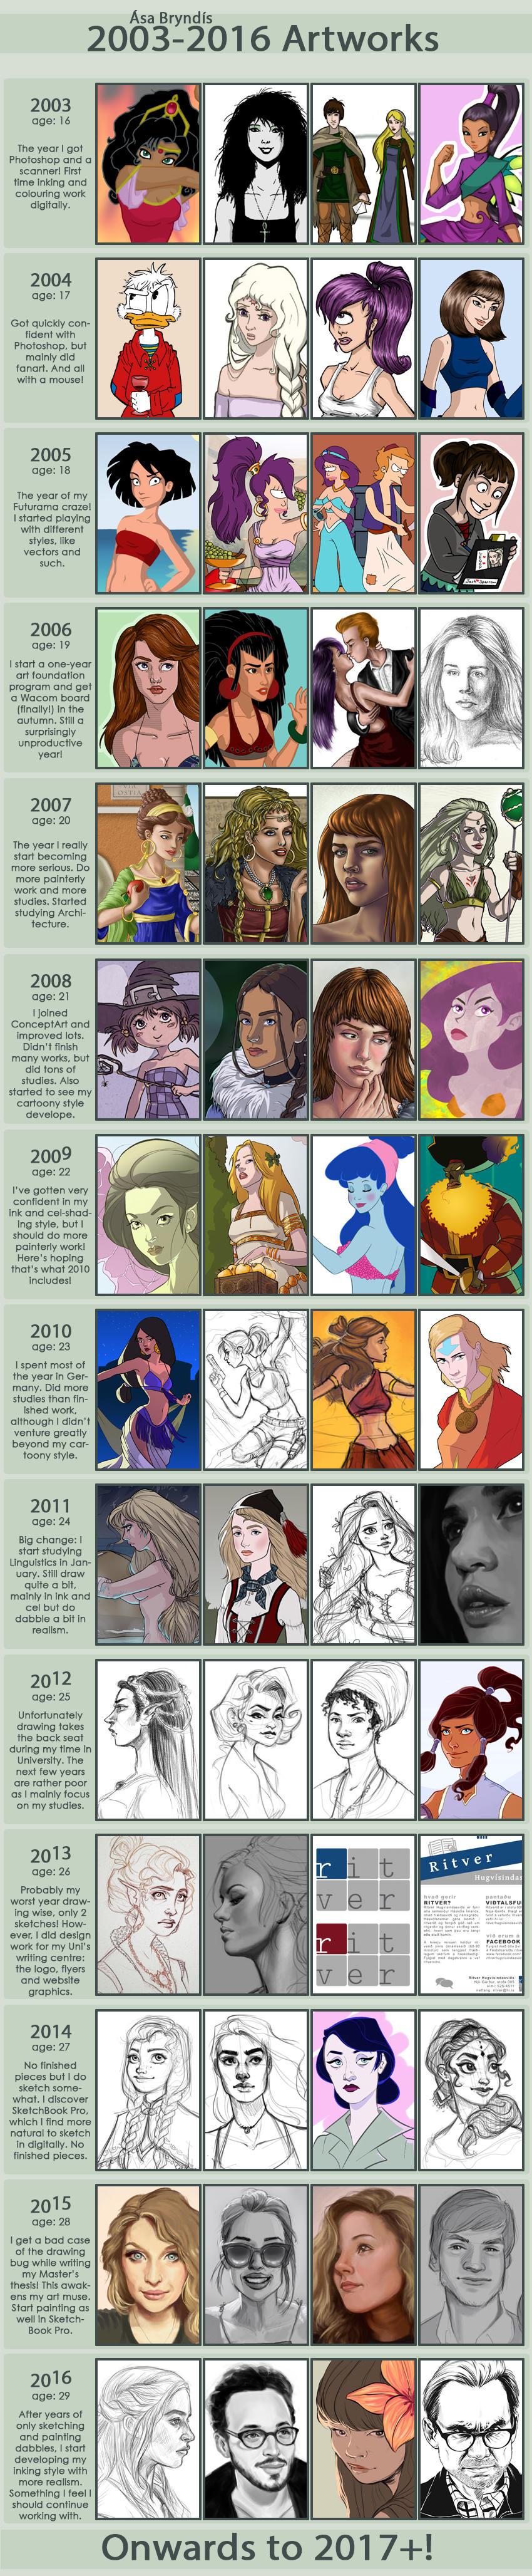 Art Improvement '03-'16 Meme by asa-bryndis